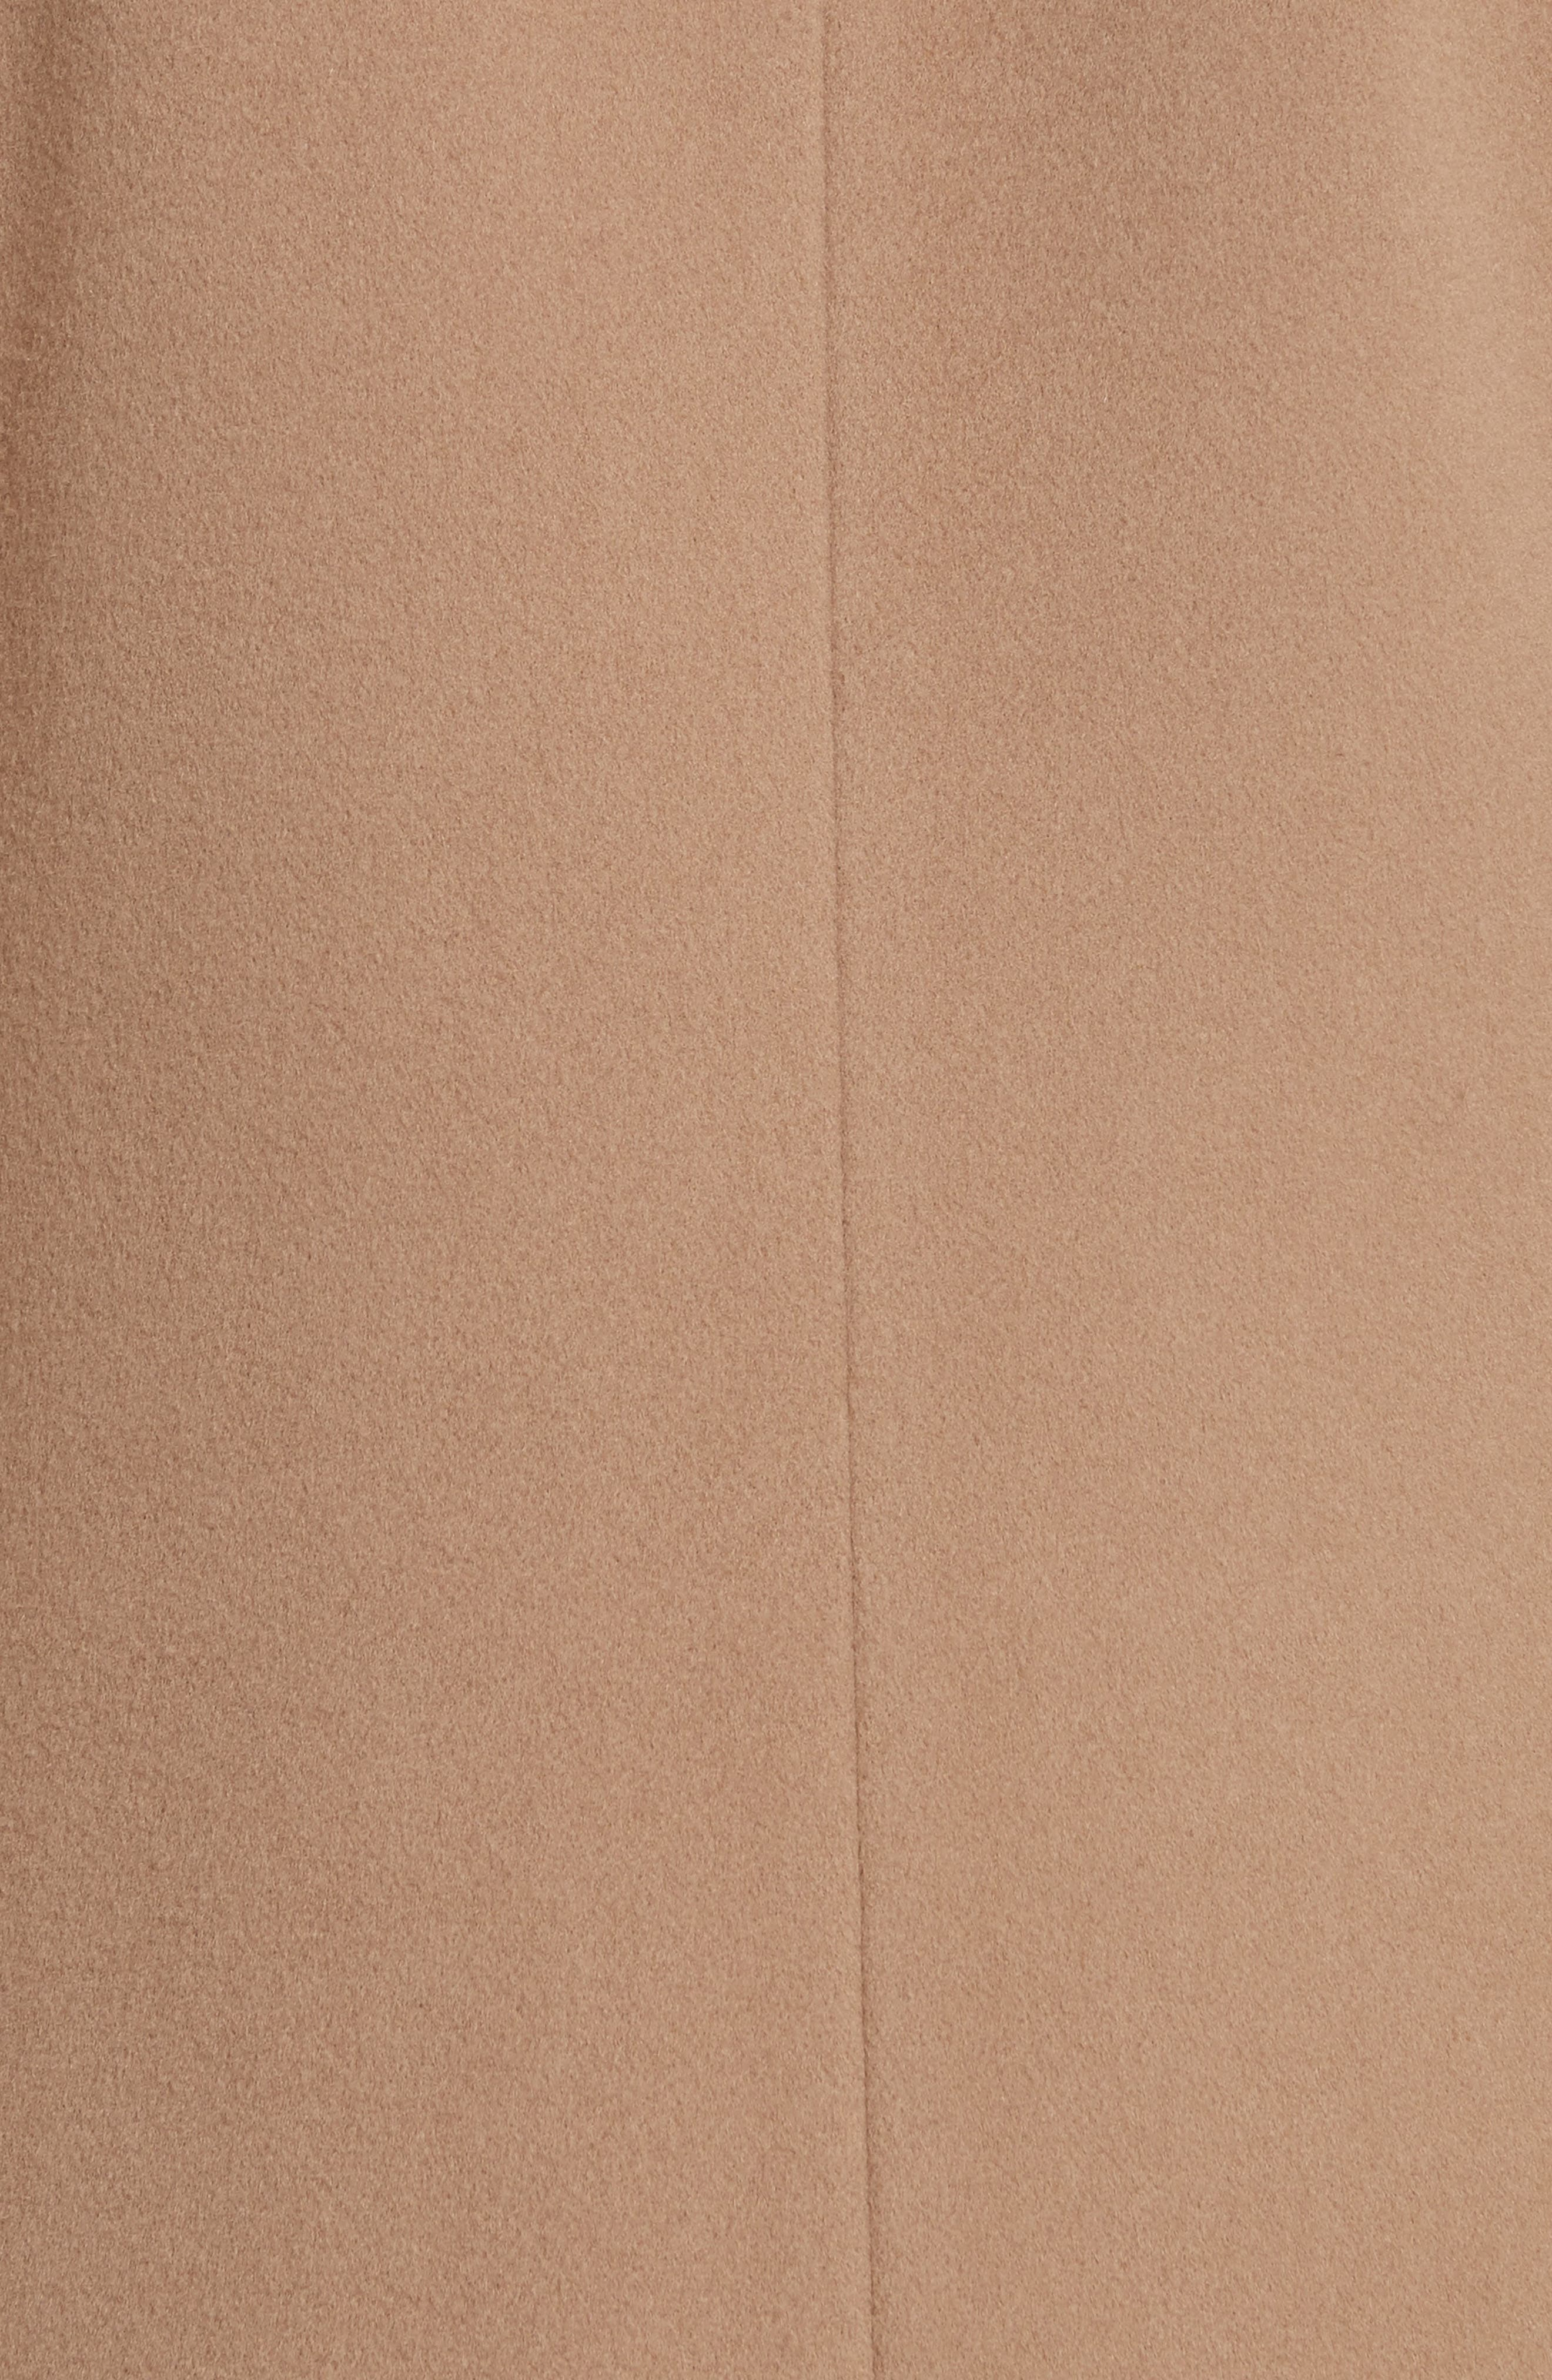 Alternate Image 3  - Givenchy Wool & Cashmere Coat